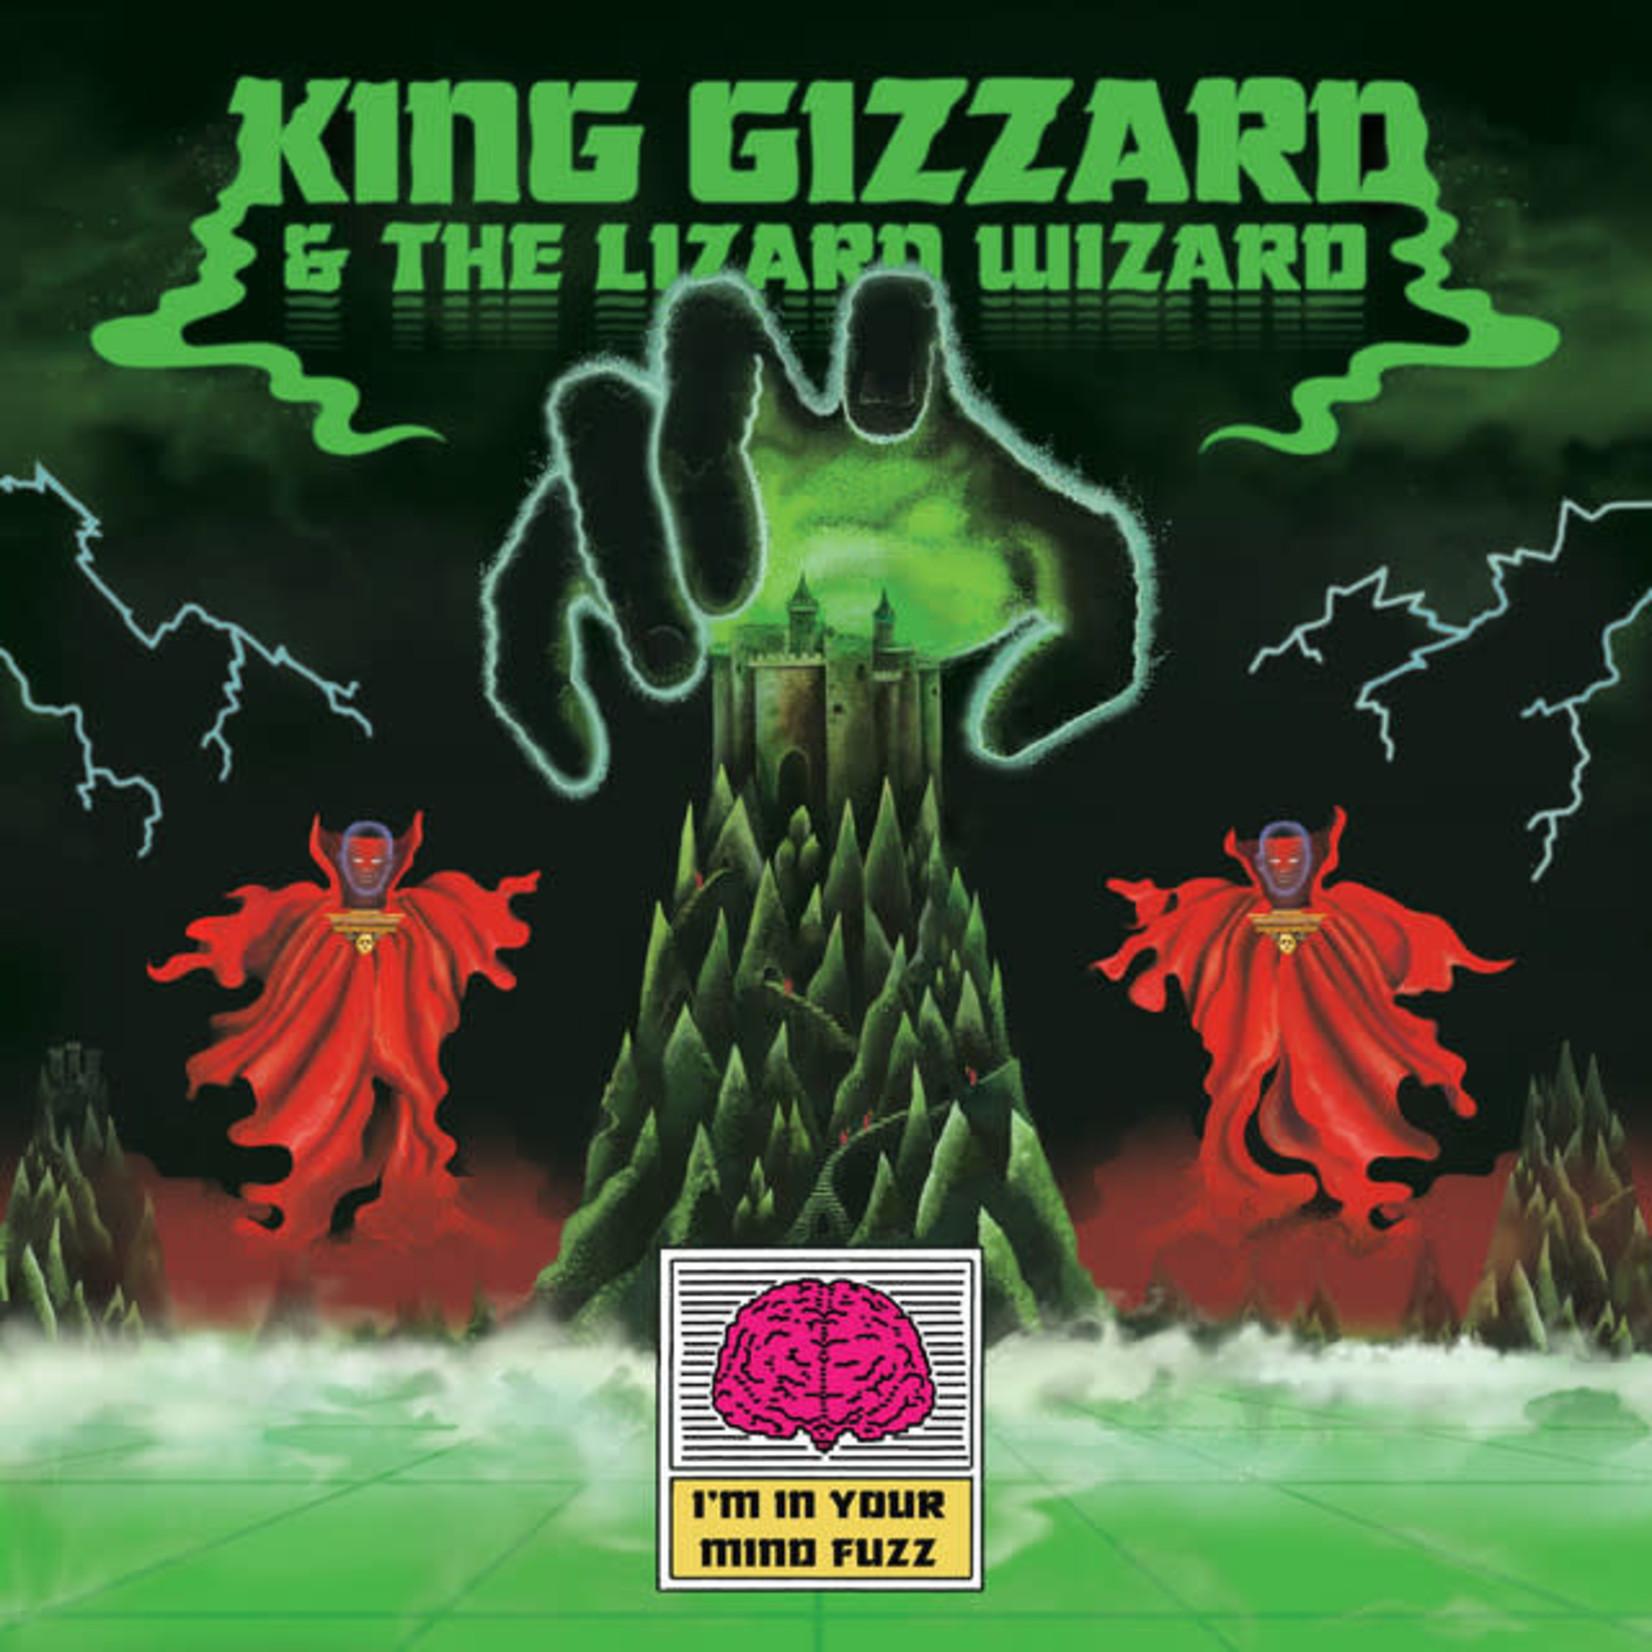 Vinyl King Gizzard - I'm in Your Mind Fuzz